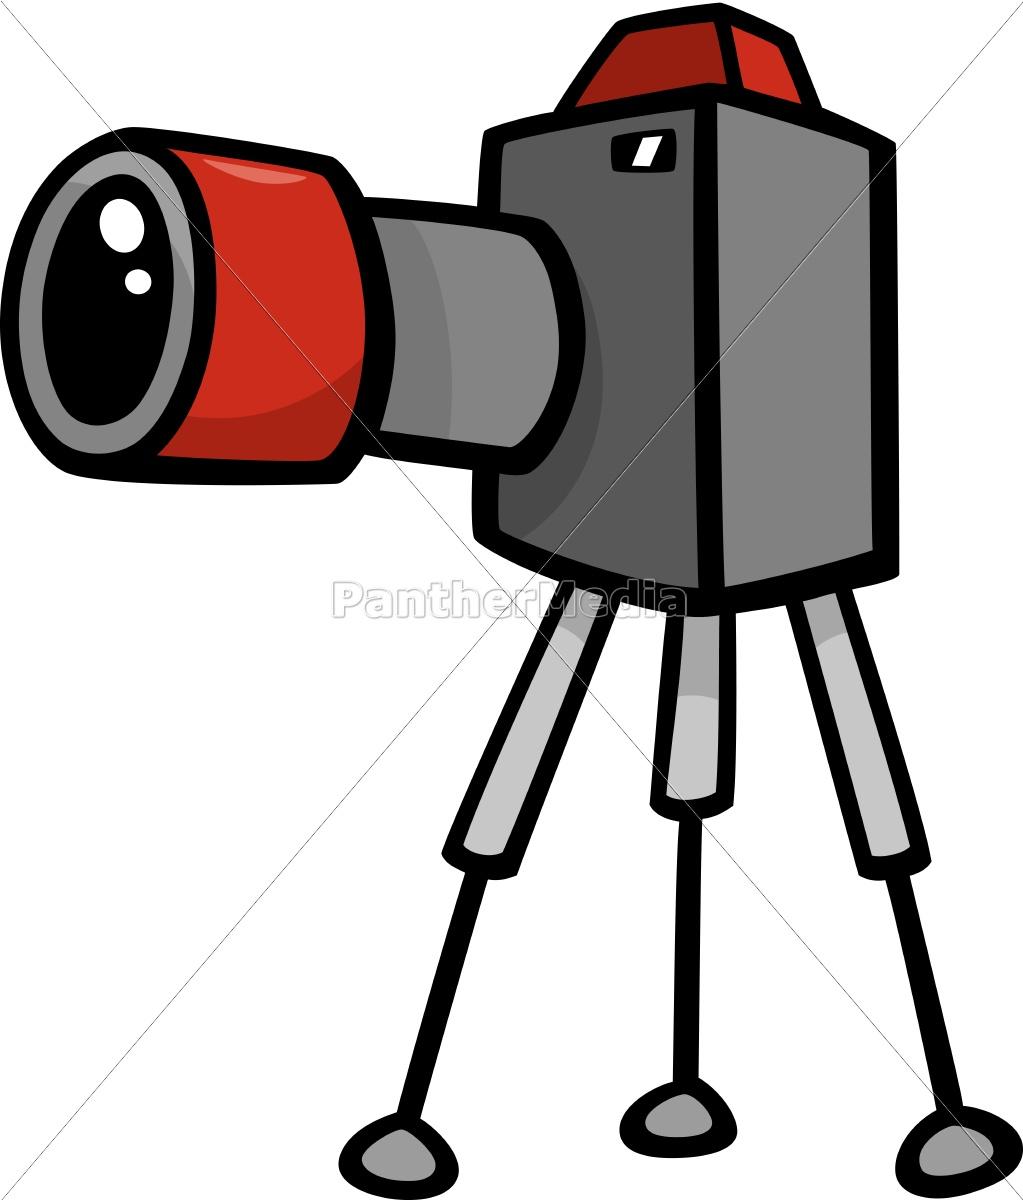 Clipart fotokamera graphic library stock Lizenzfreie Vektorgrafik 9755796 - kamera clip art cartoon abbildung graphic library stock